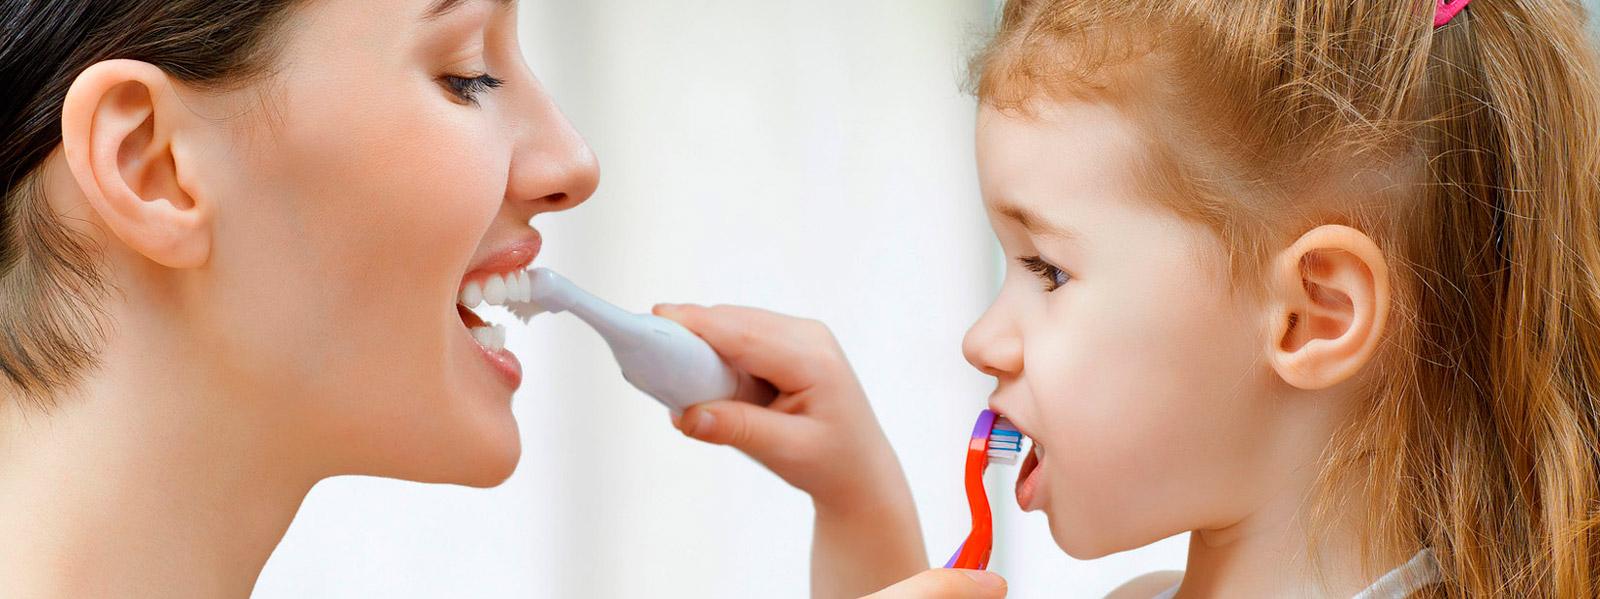 familia_tratamientos_dentales_clinica_mallorca_dentista_1600x600